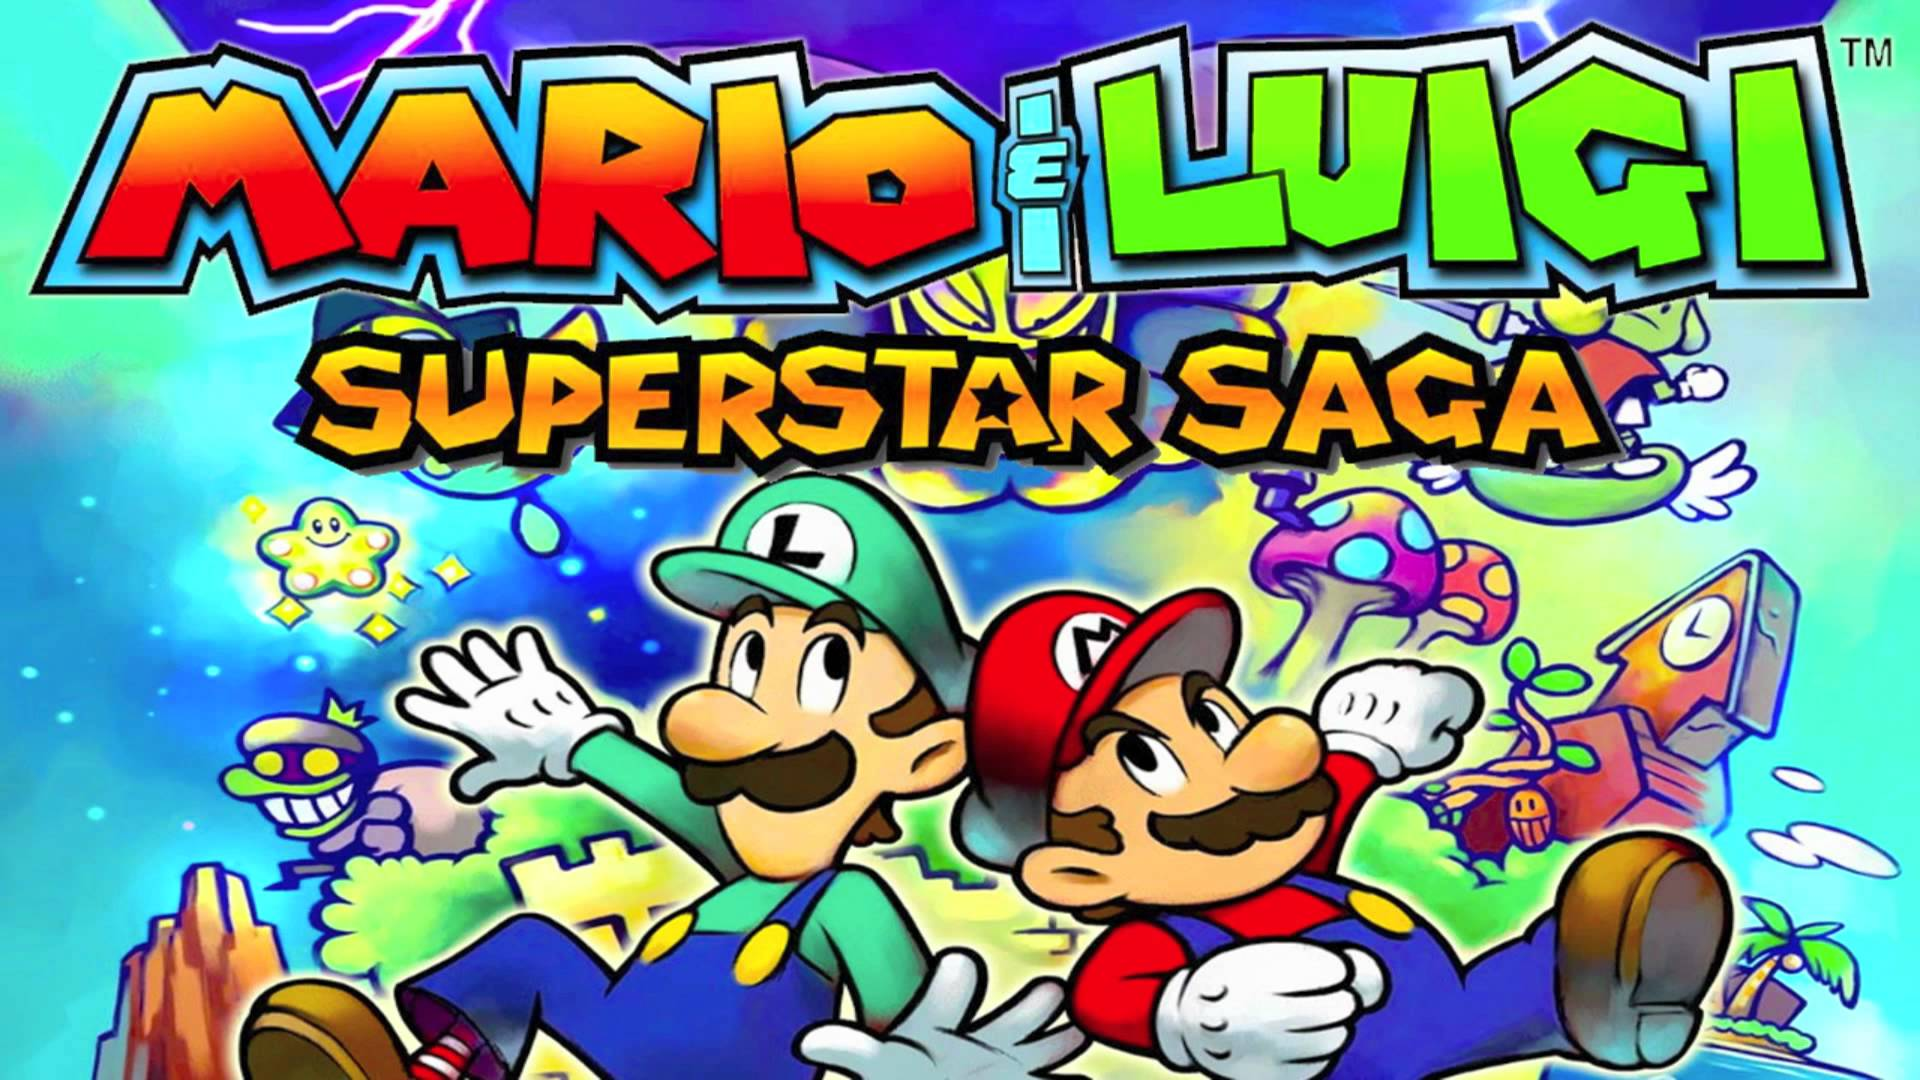 Scarica Mario e Luigi Superstar Saga per Android 1